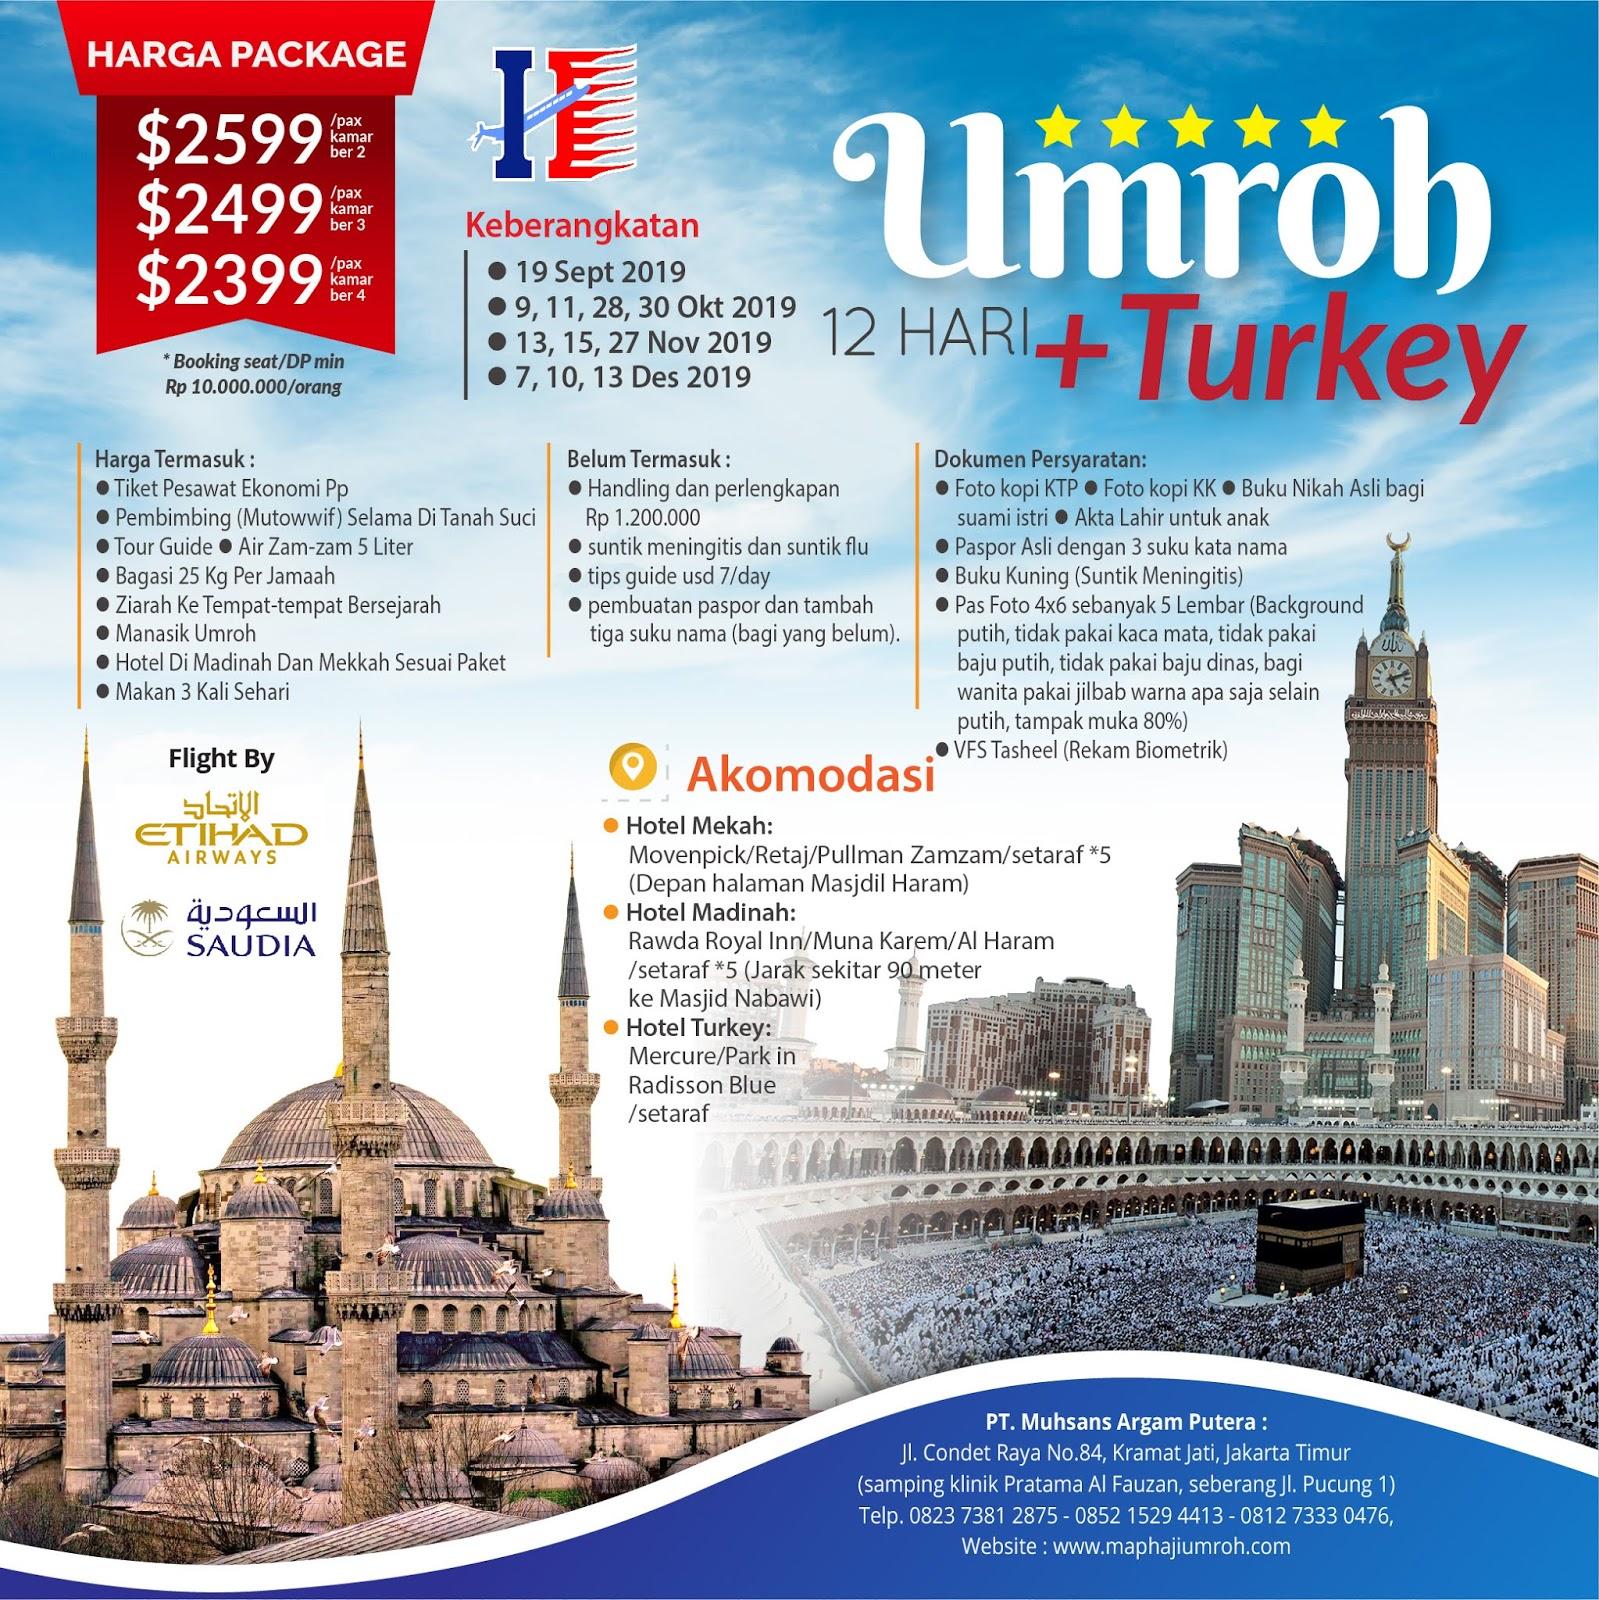 Umroh plus turki map tour.